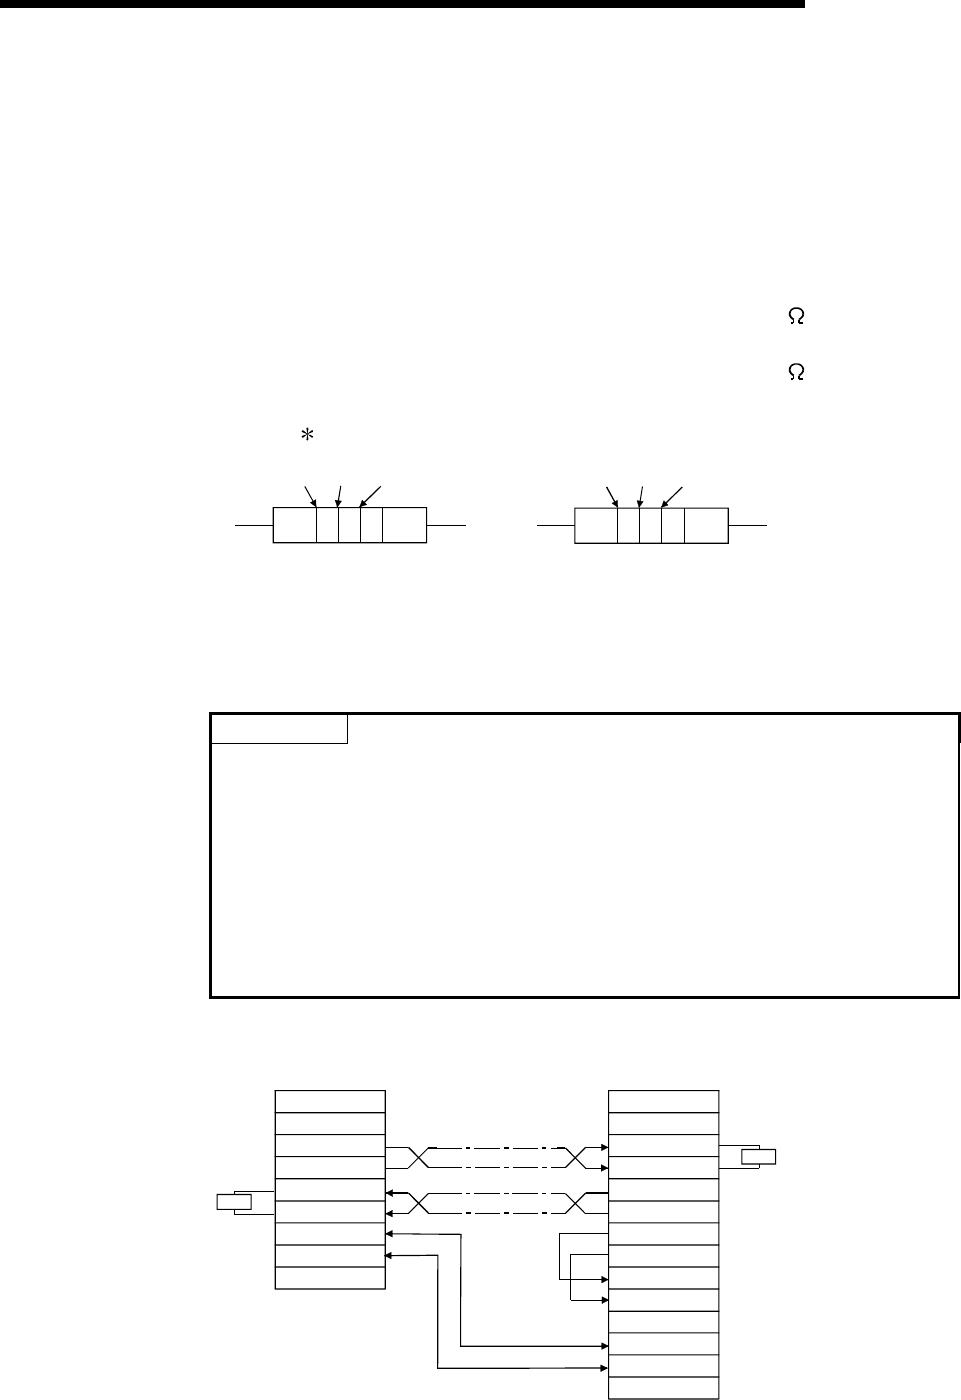 Mitsubishi Electronics Qj71c24n Users Manual Q Corresponding Serial 12v 8211 32 V 5a Power Supply By Lm338 4 9